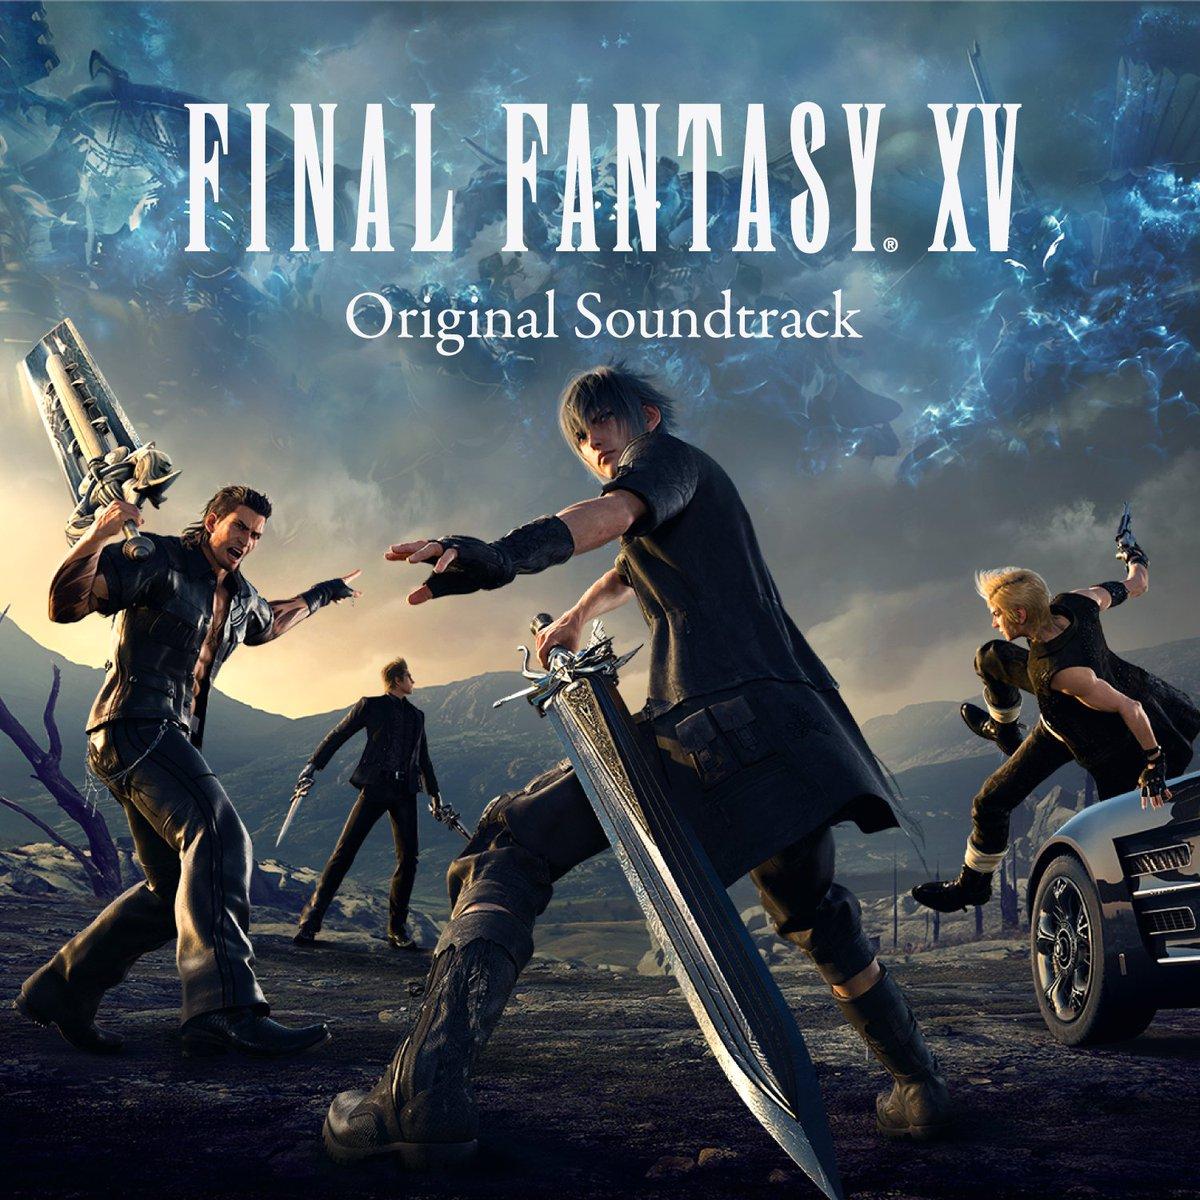 final fantasy xv on twitter the final fantasy xv original